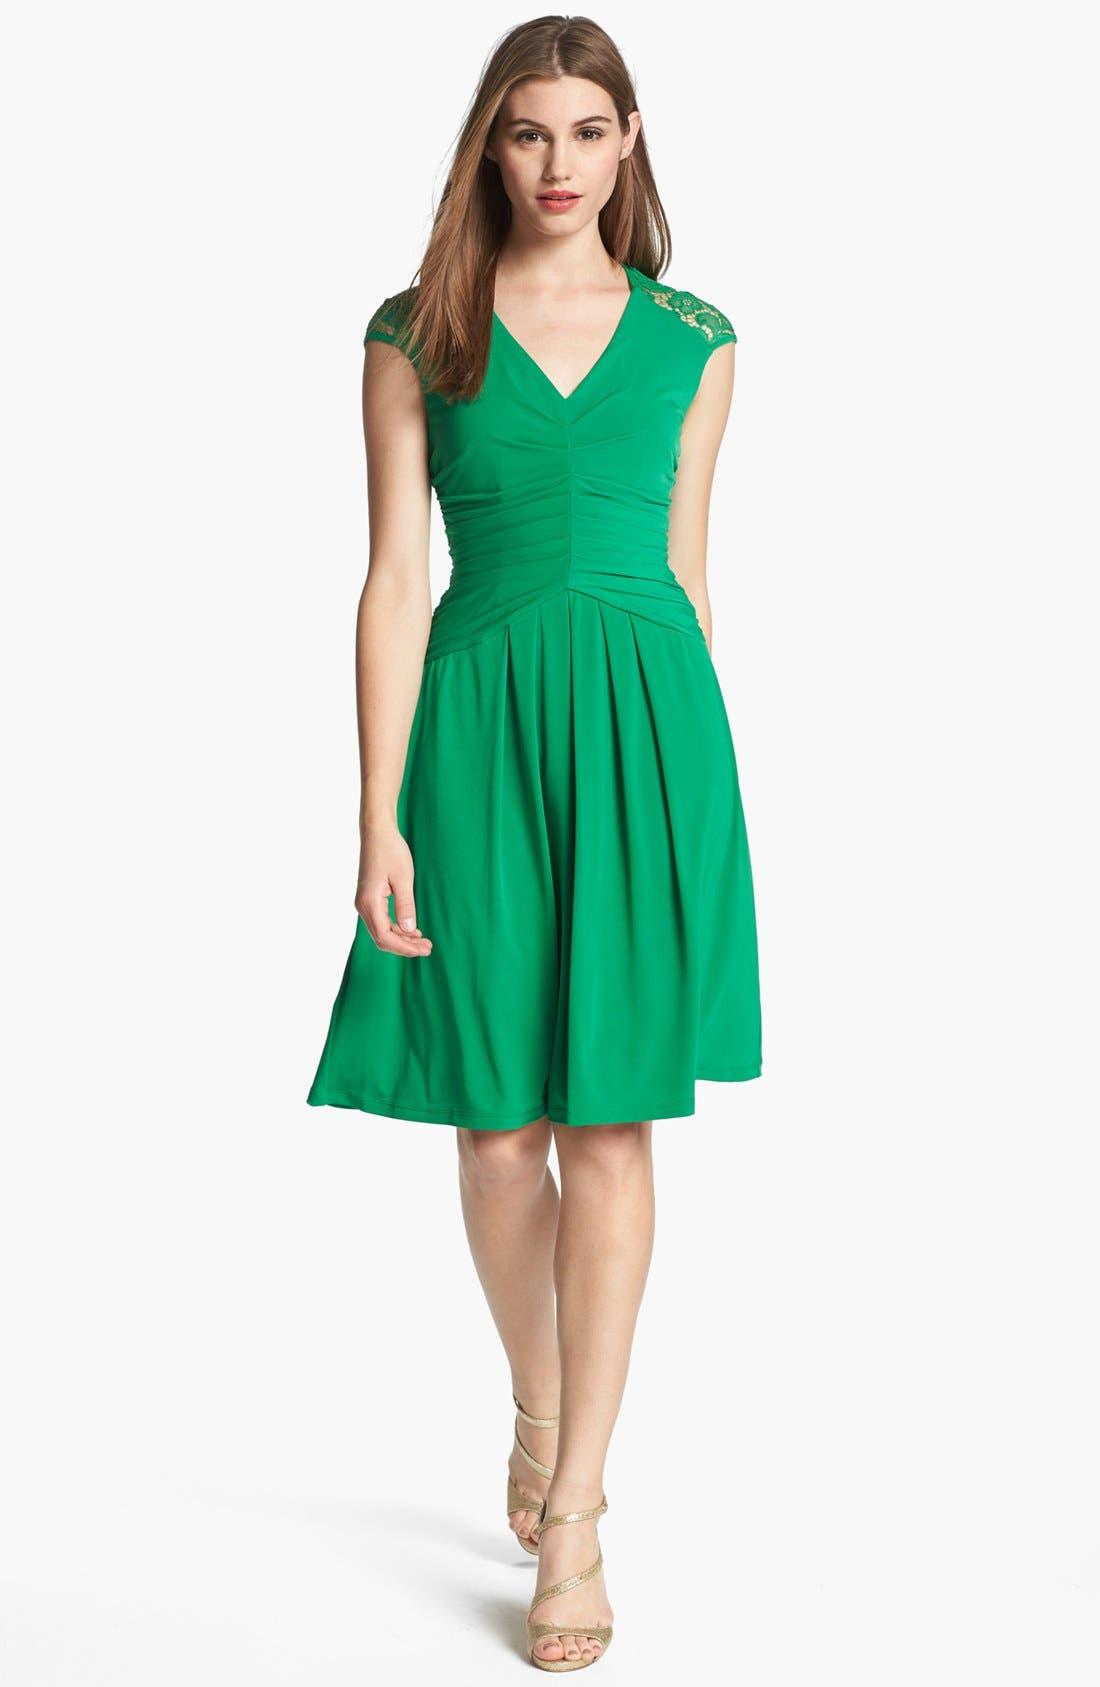 Alternate Image 1 Selected - Ivy & Blu Lace Back Jersey Dress